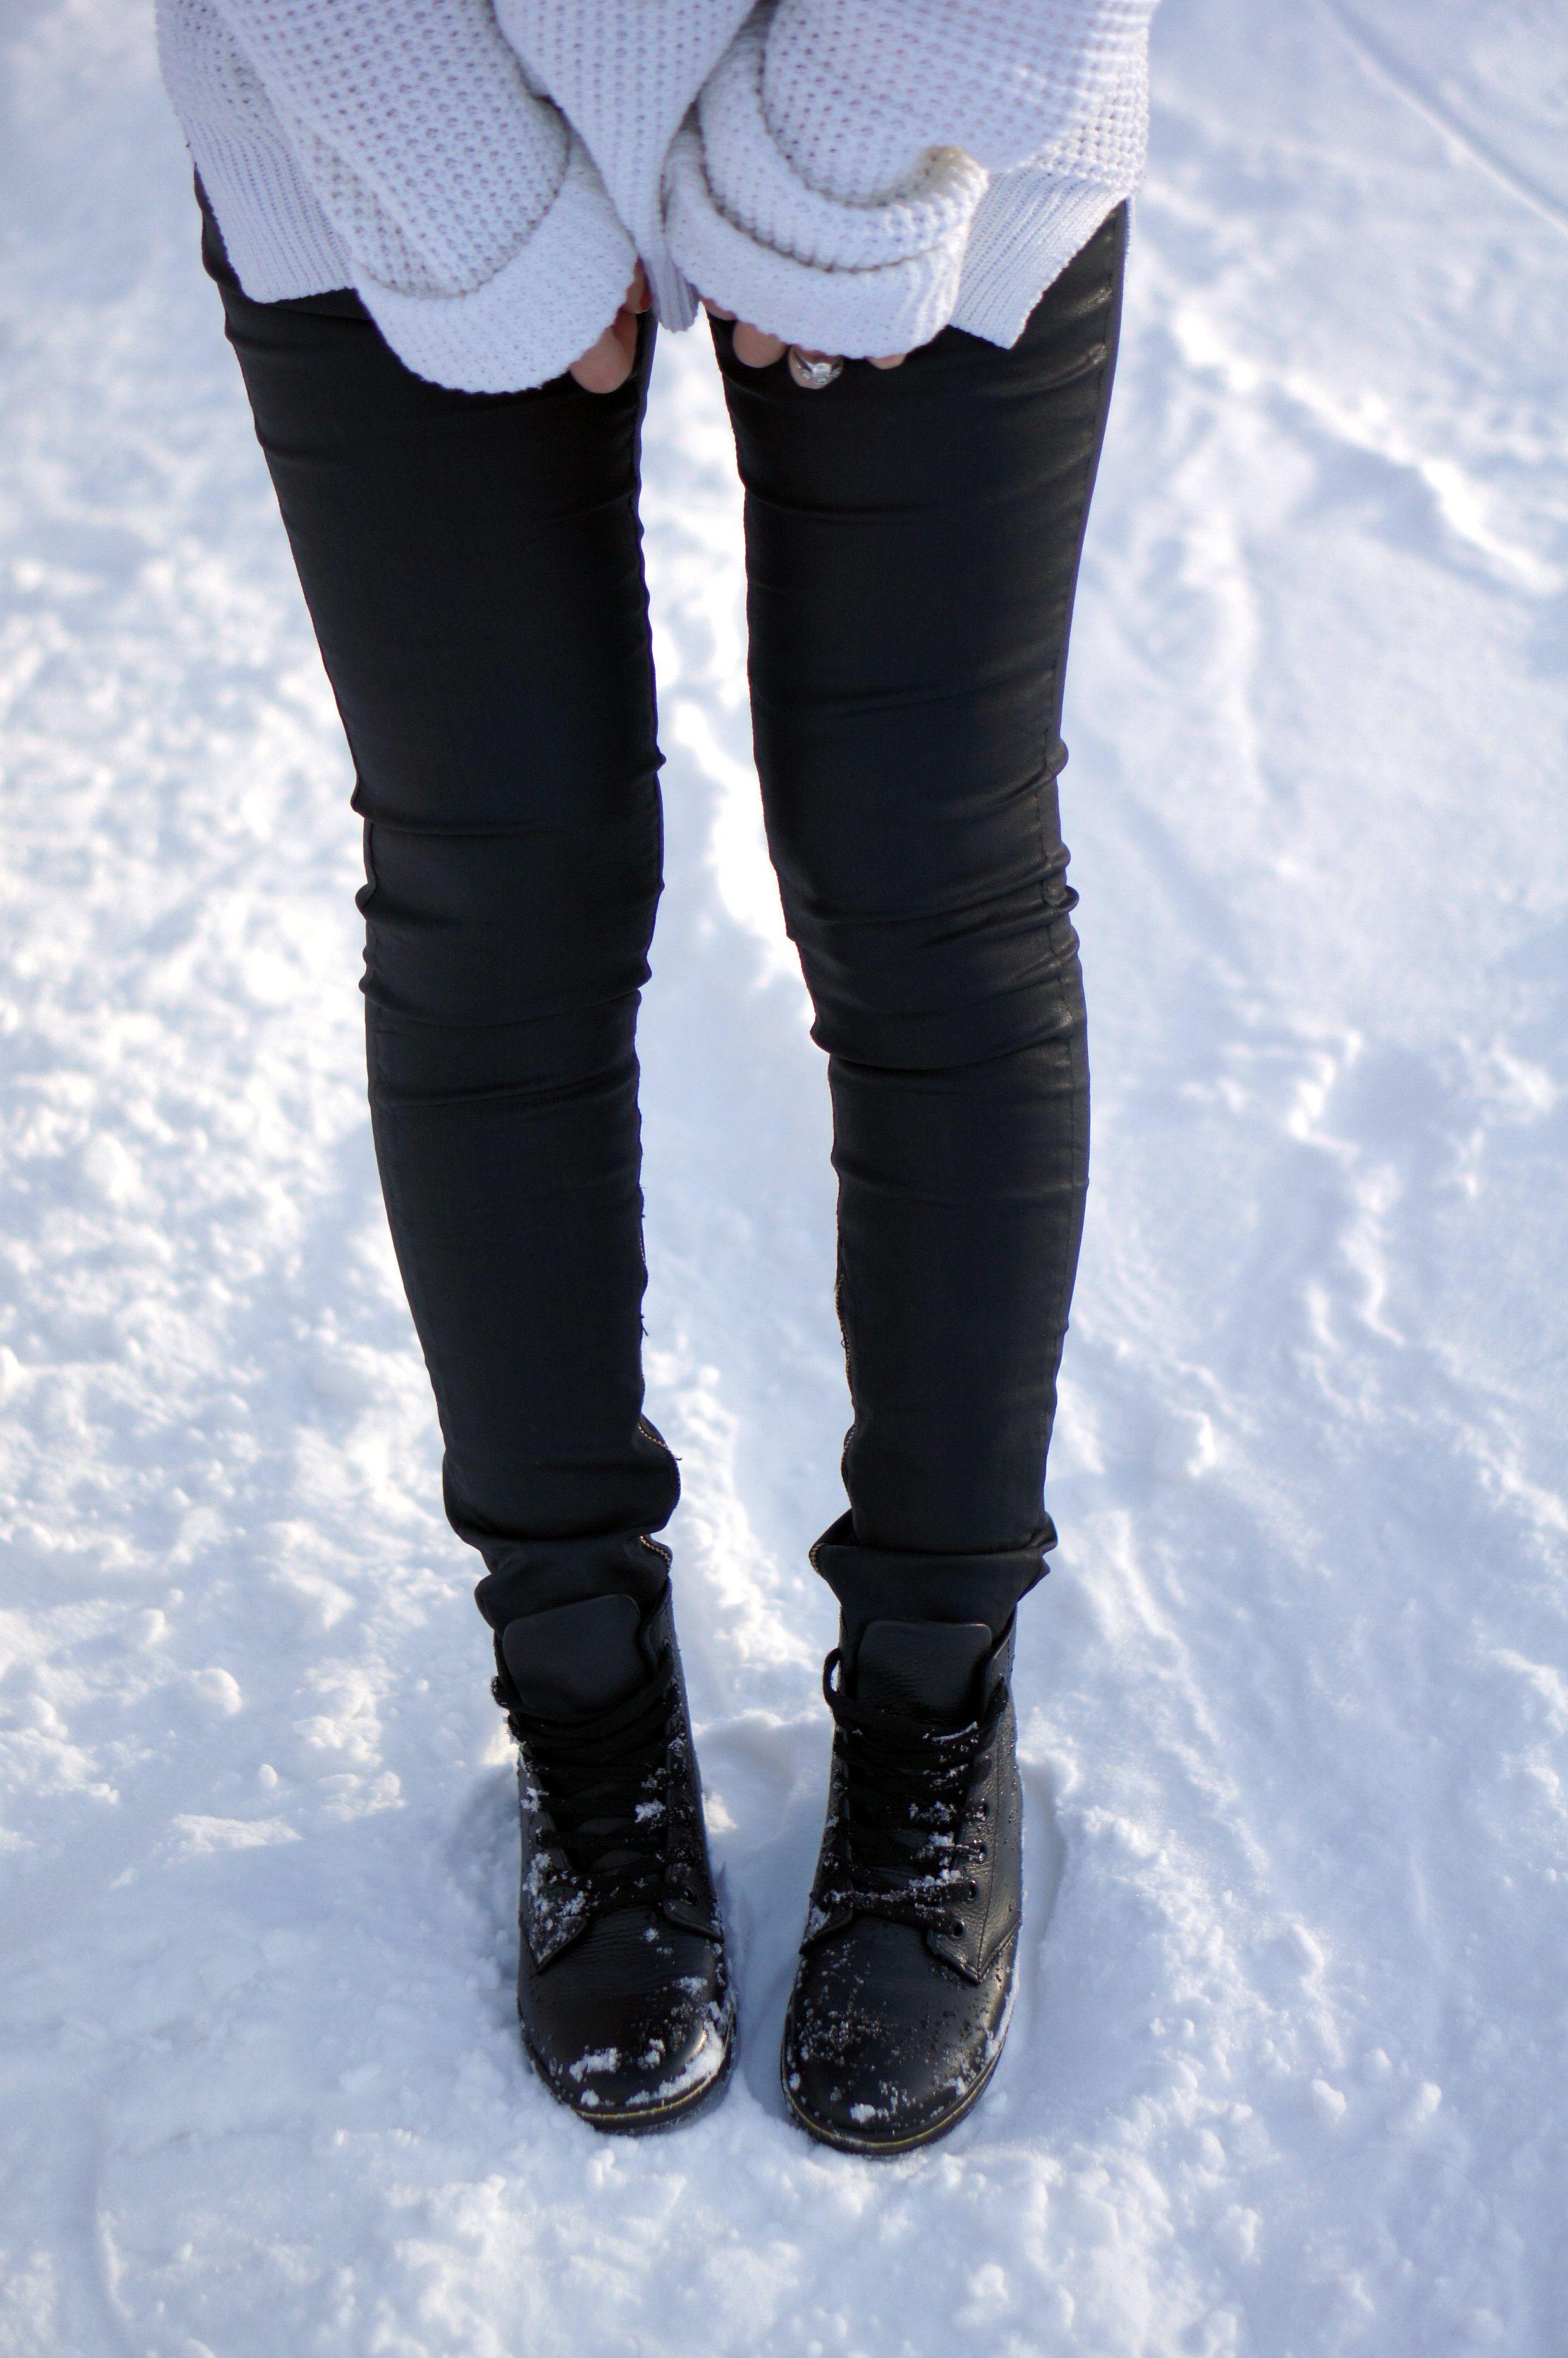 f2dc610e4a9 Snow Look...Dr.Martens Leyton boots!